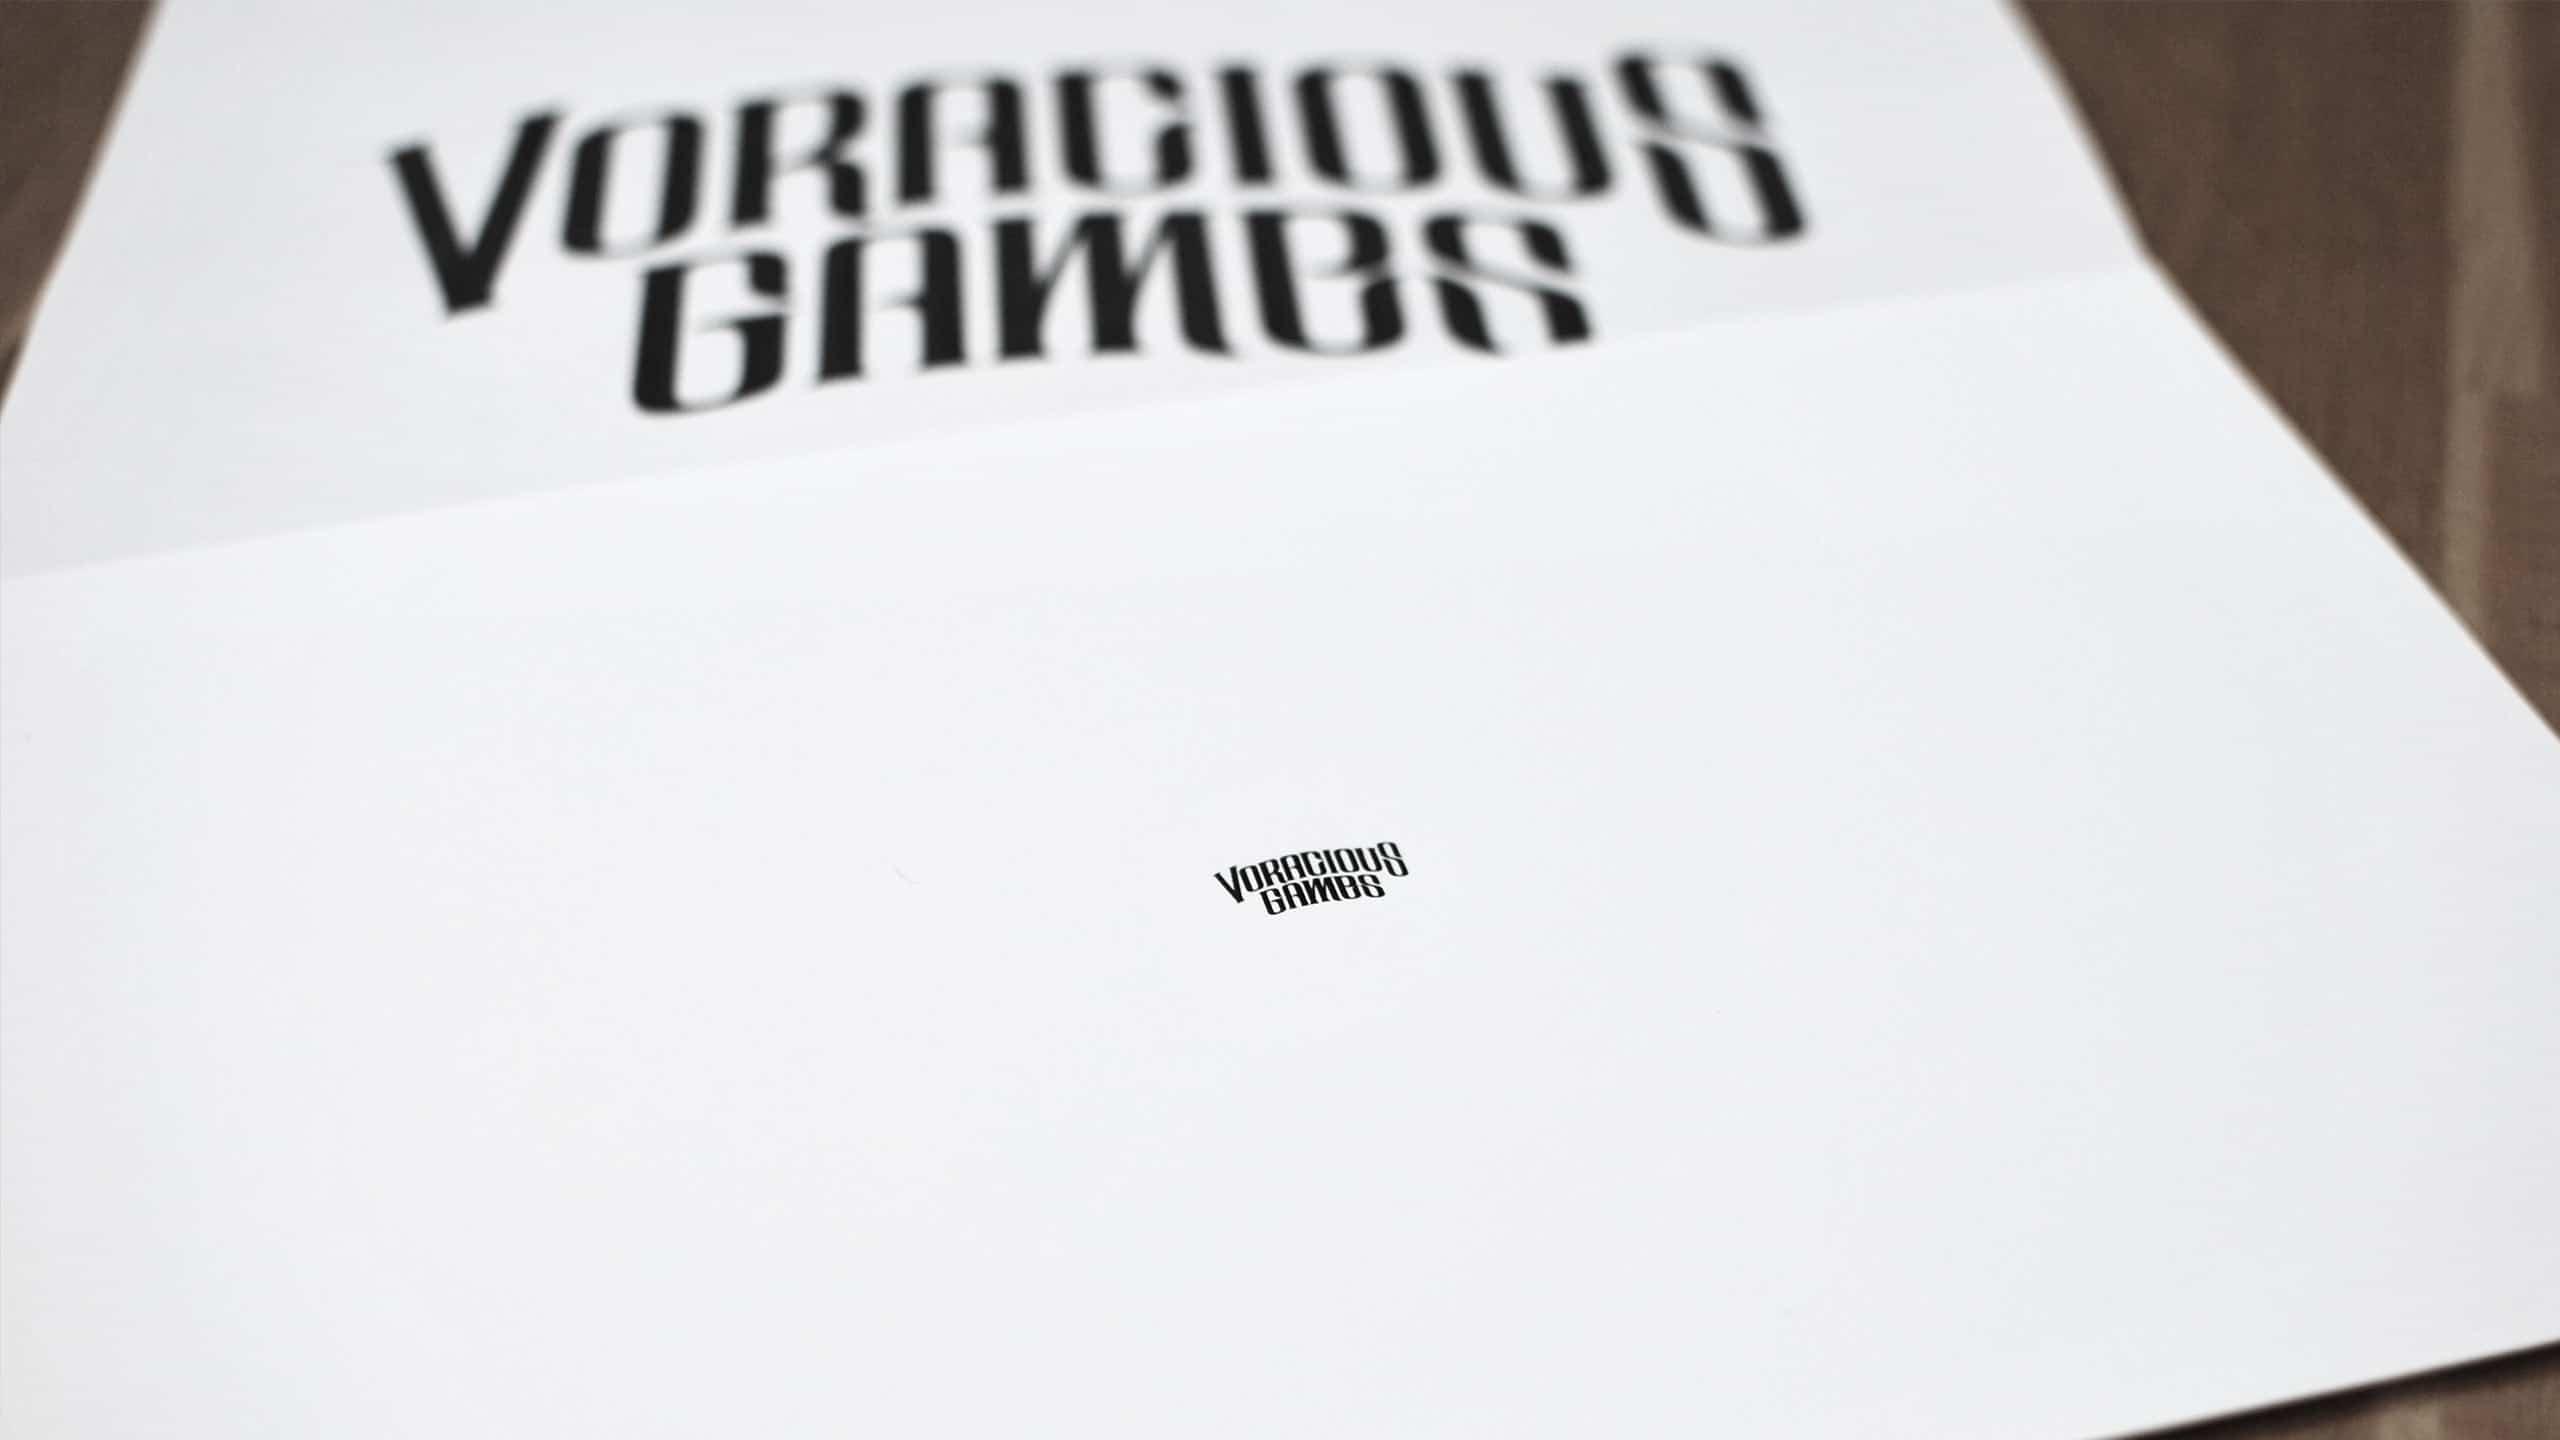 Small print logo for Voracious Games